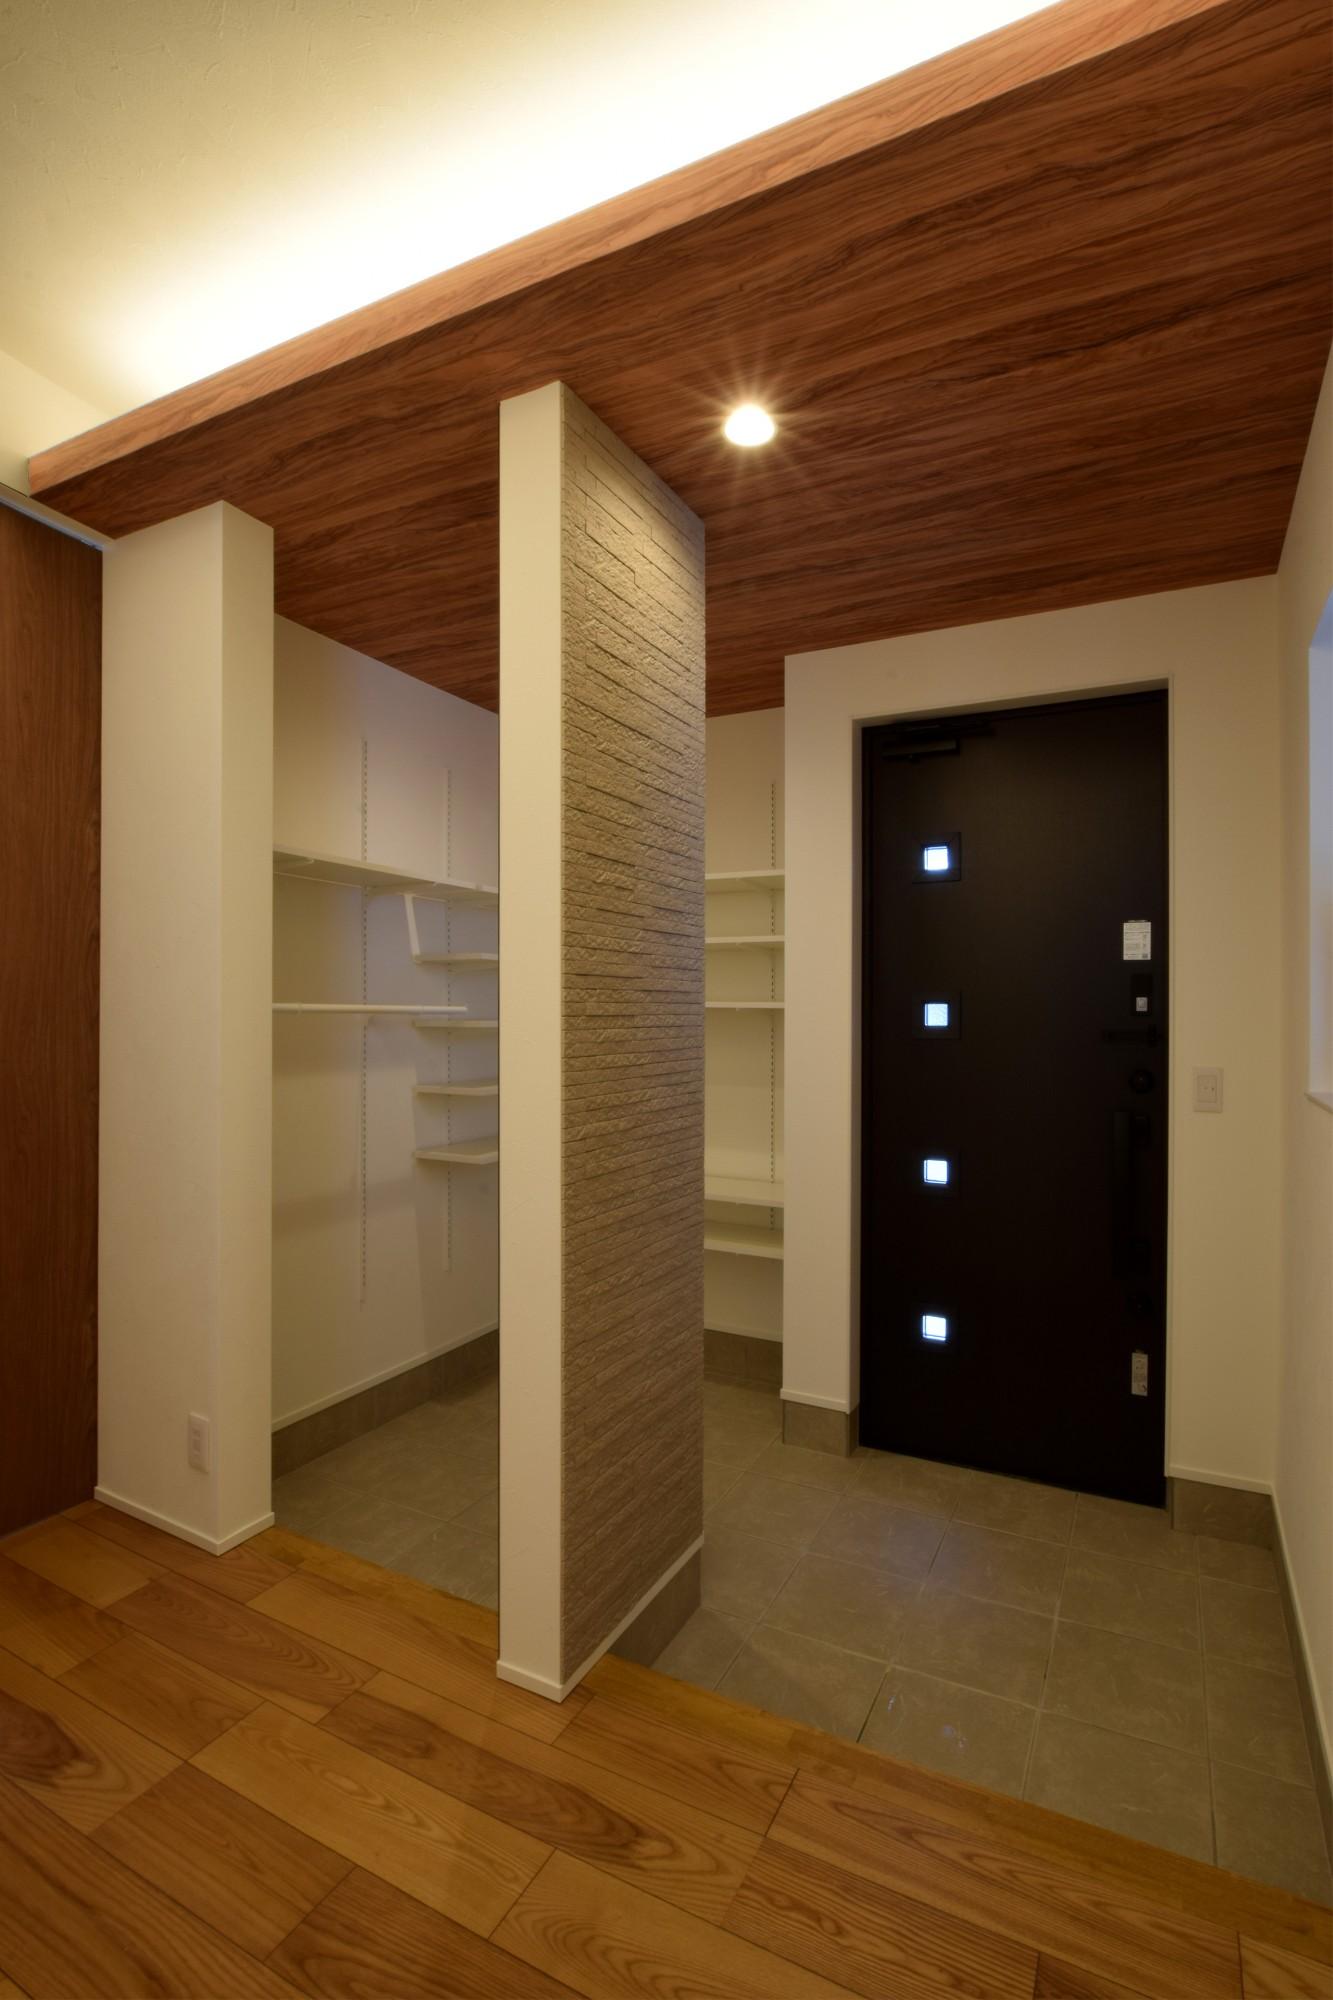 DETAIL HOME(ディテールホーム)「おうち時間を大切にした住まい」のシンプル・ナチュラルな玄関の実例写真